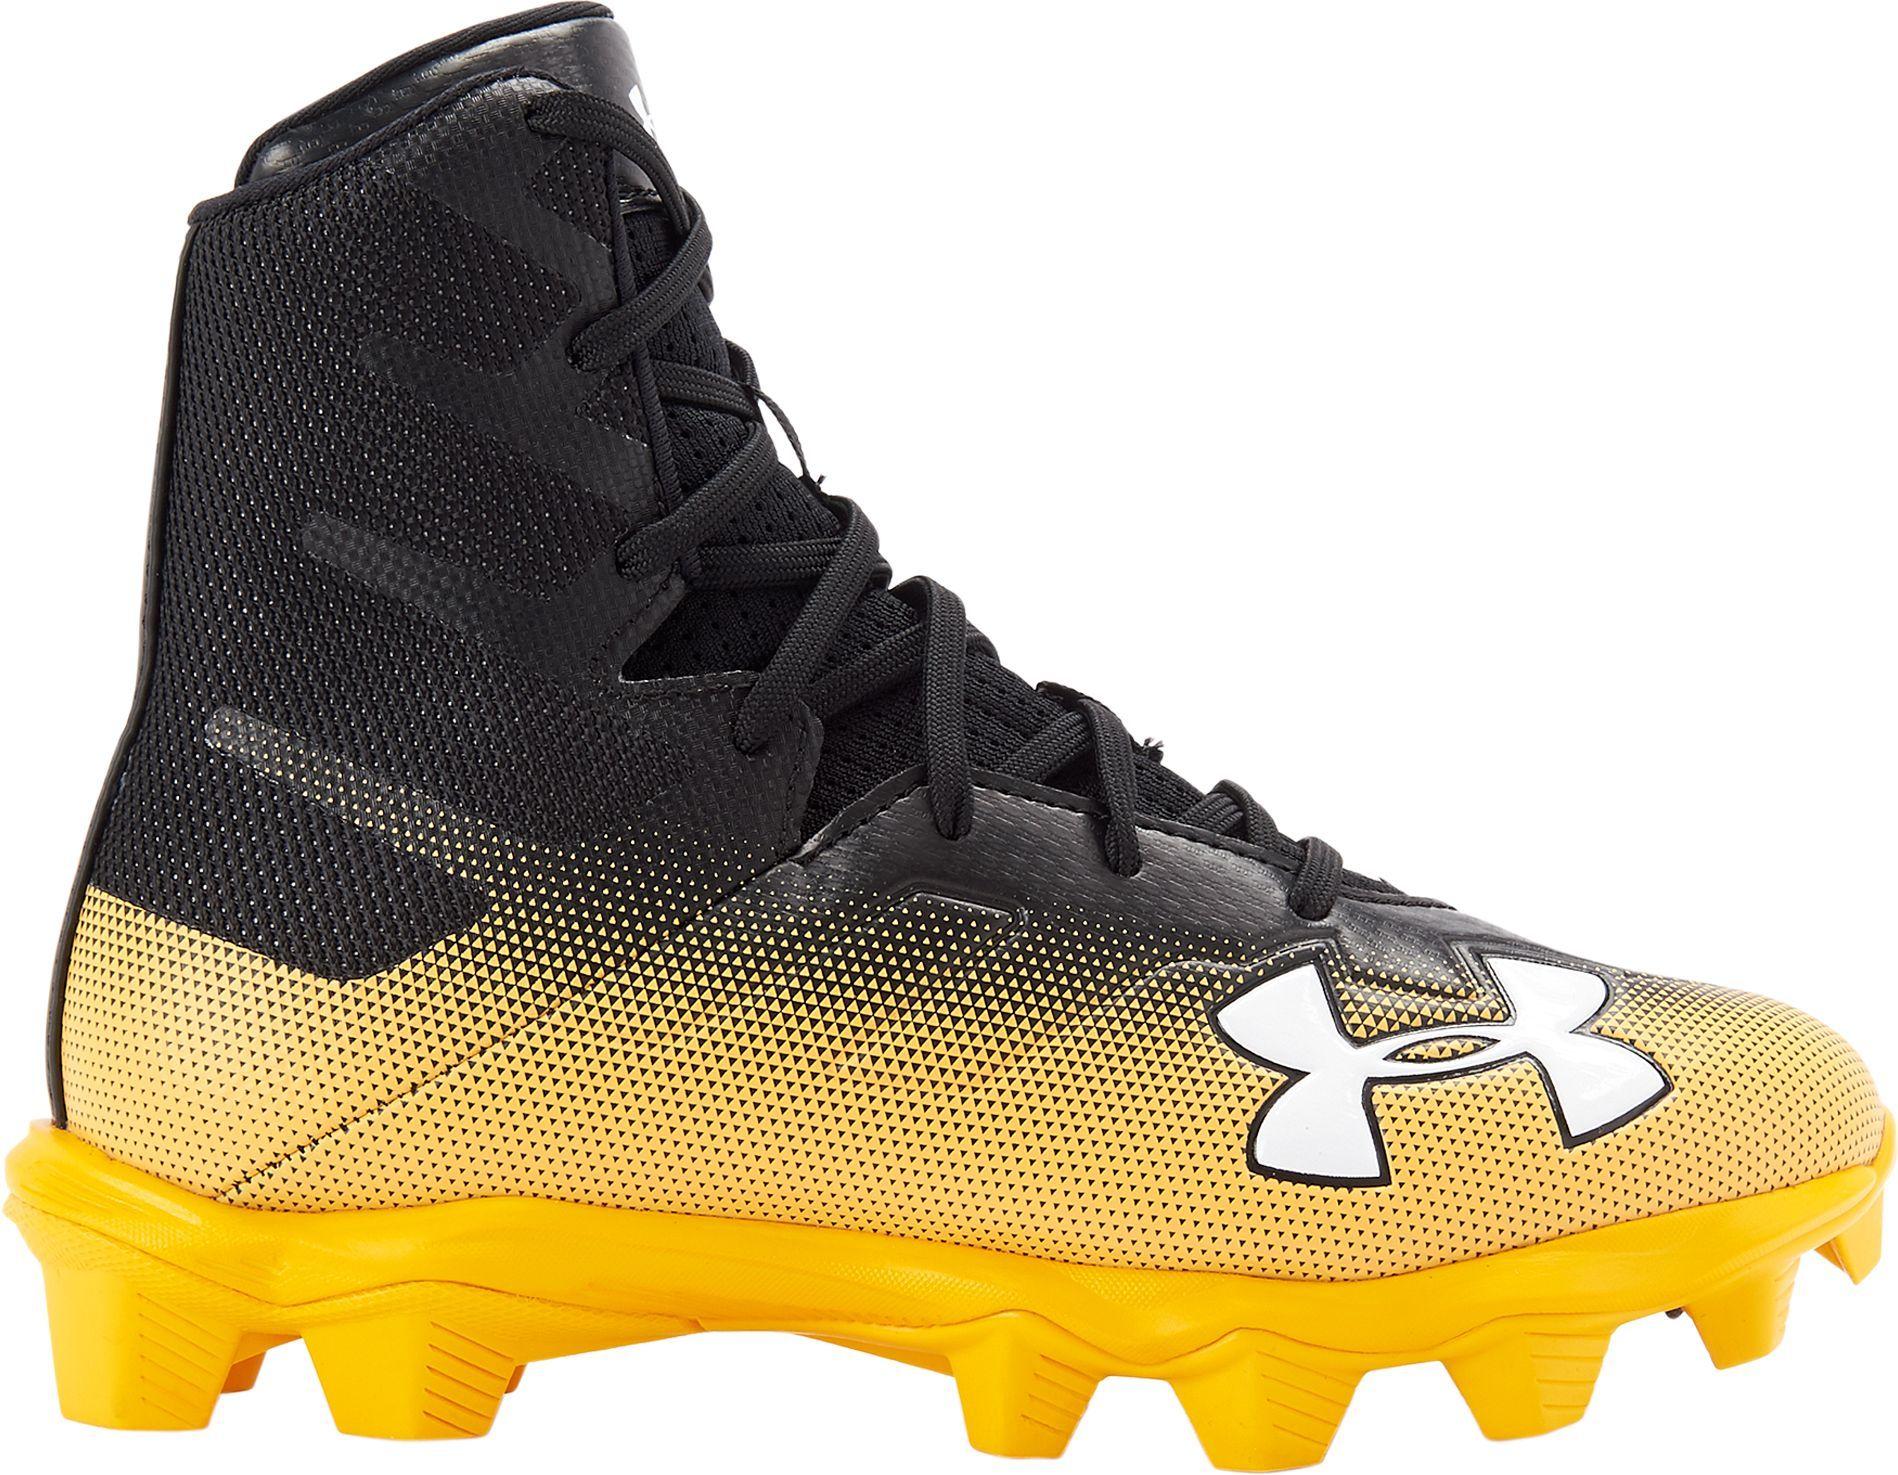 7b9f9b5b6c0f Under Armour Kids' Highlight RM Football Cleats, Size: 3.5, Black